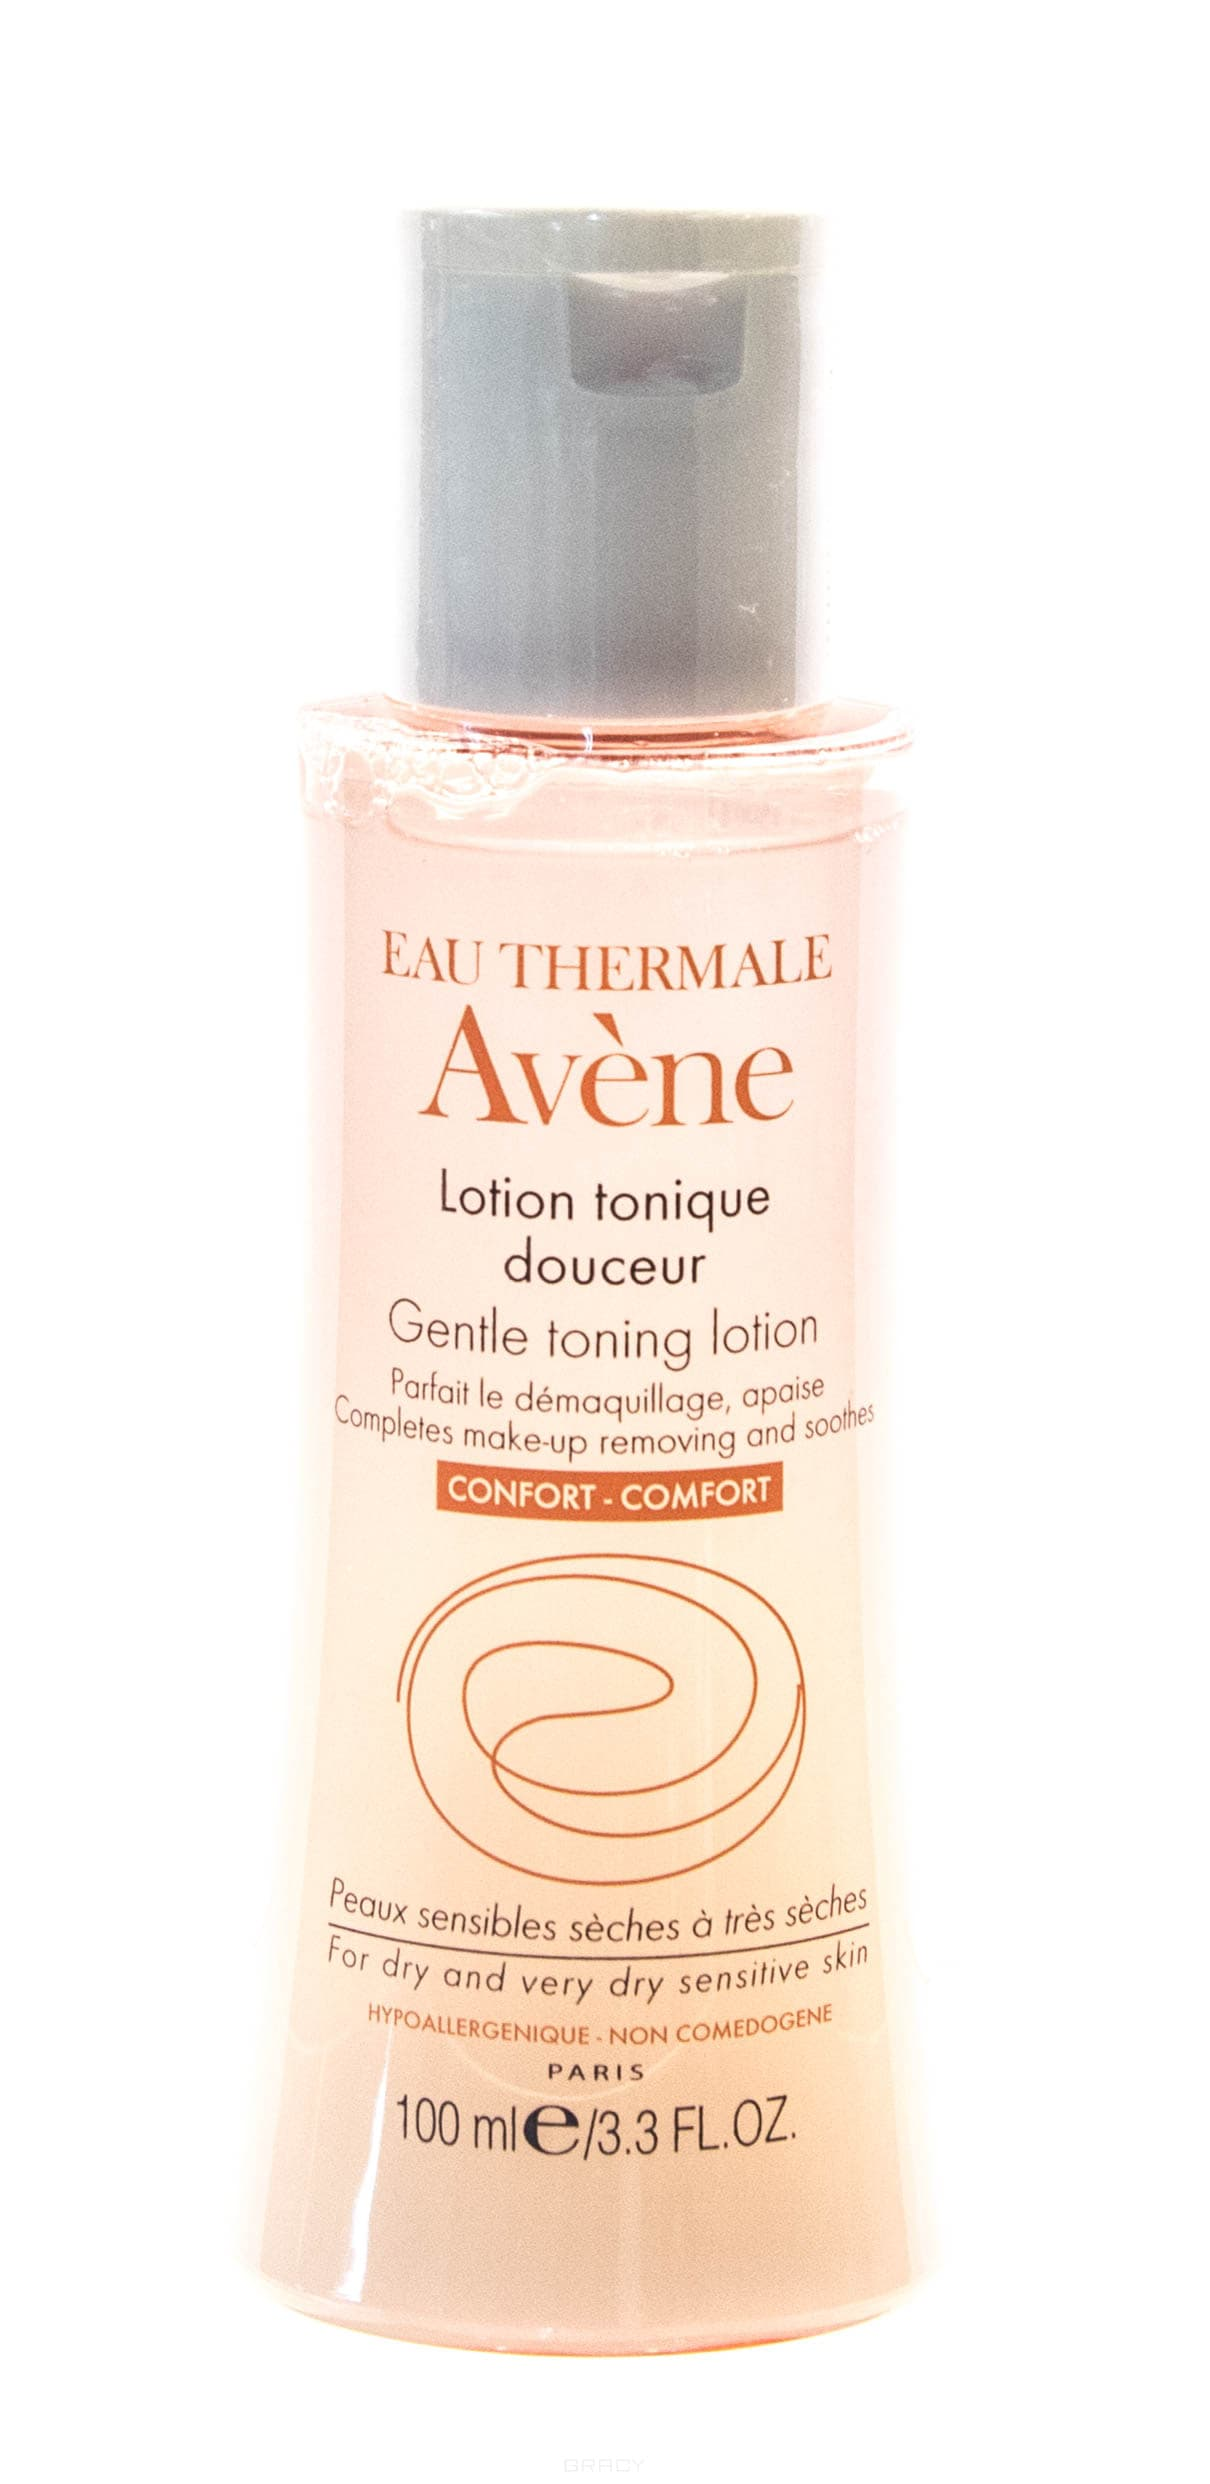 Avene, Мягкий тонизирующий лосьон, 100 мл термальная вода avene где купить